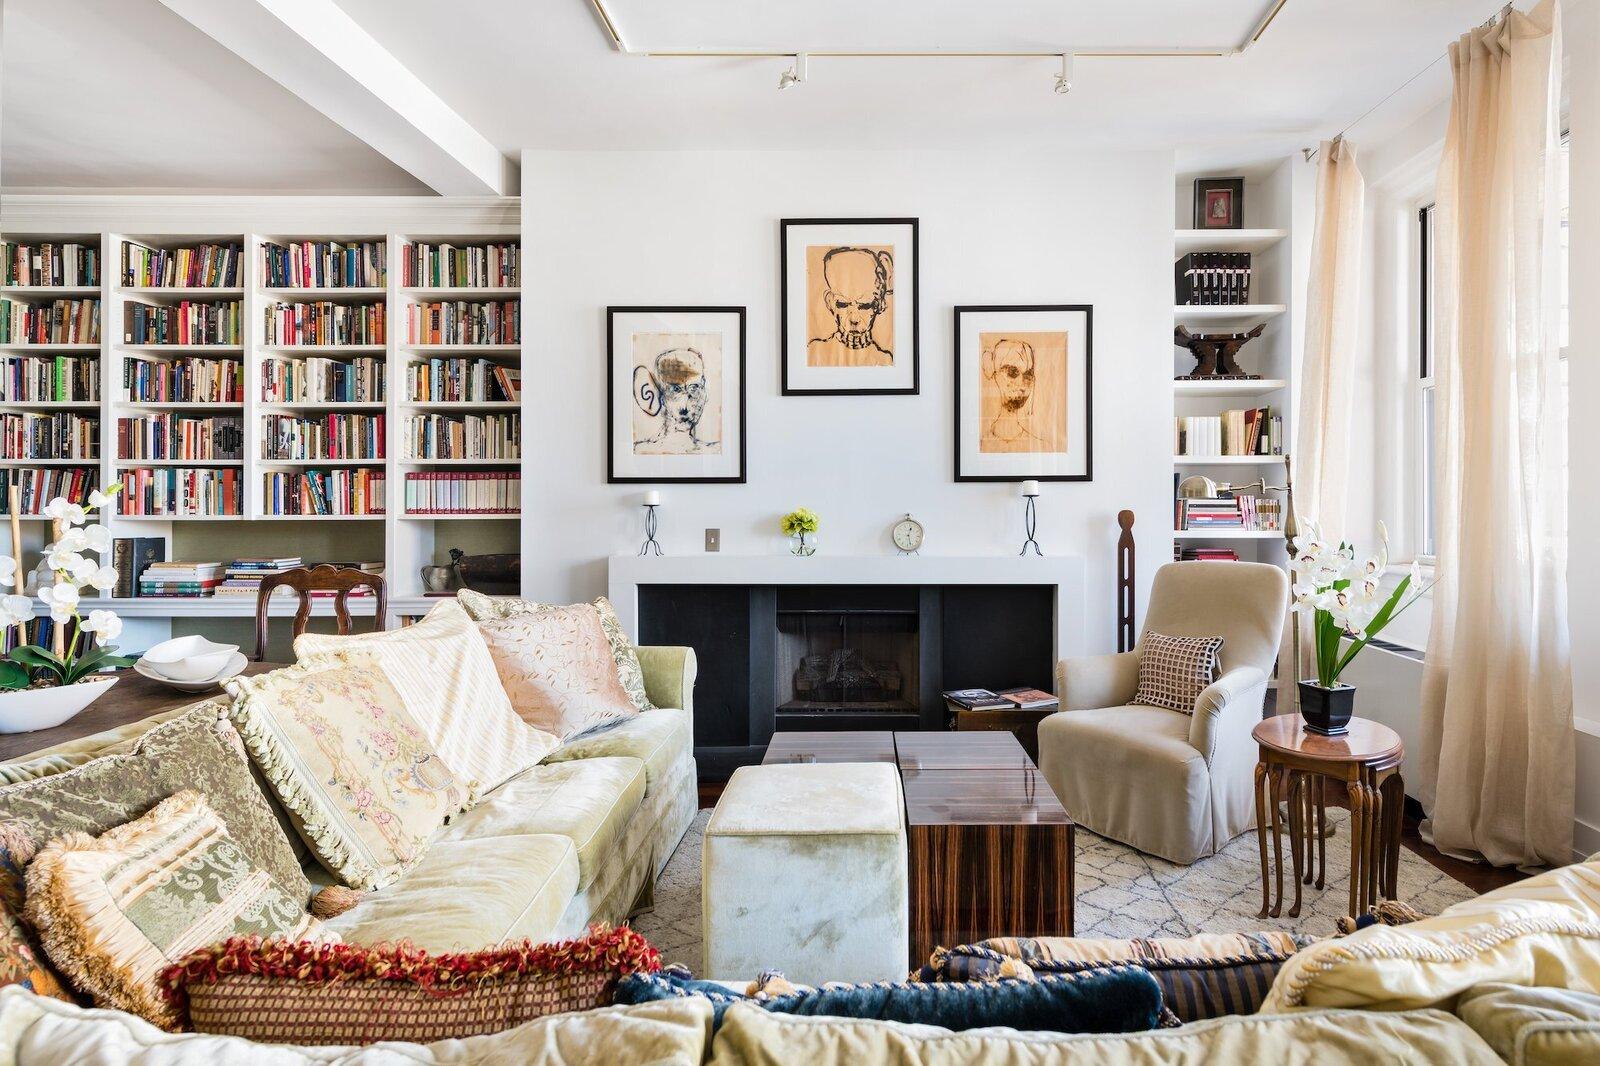 Peek Inside Literary Legend Toni Morrison's Manhattan Condo—Now Asking $4.25M